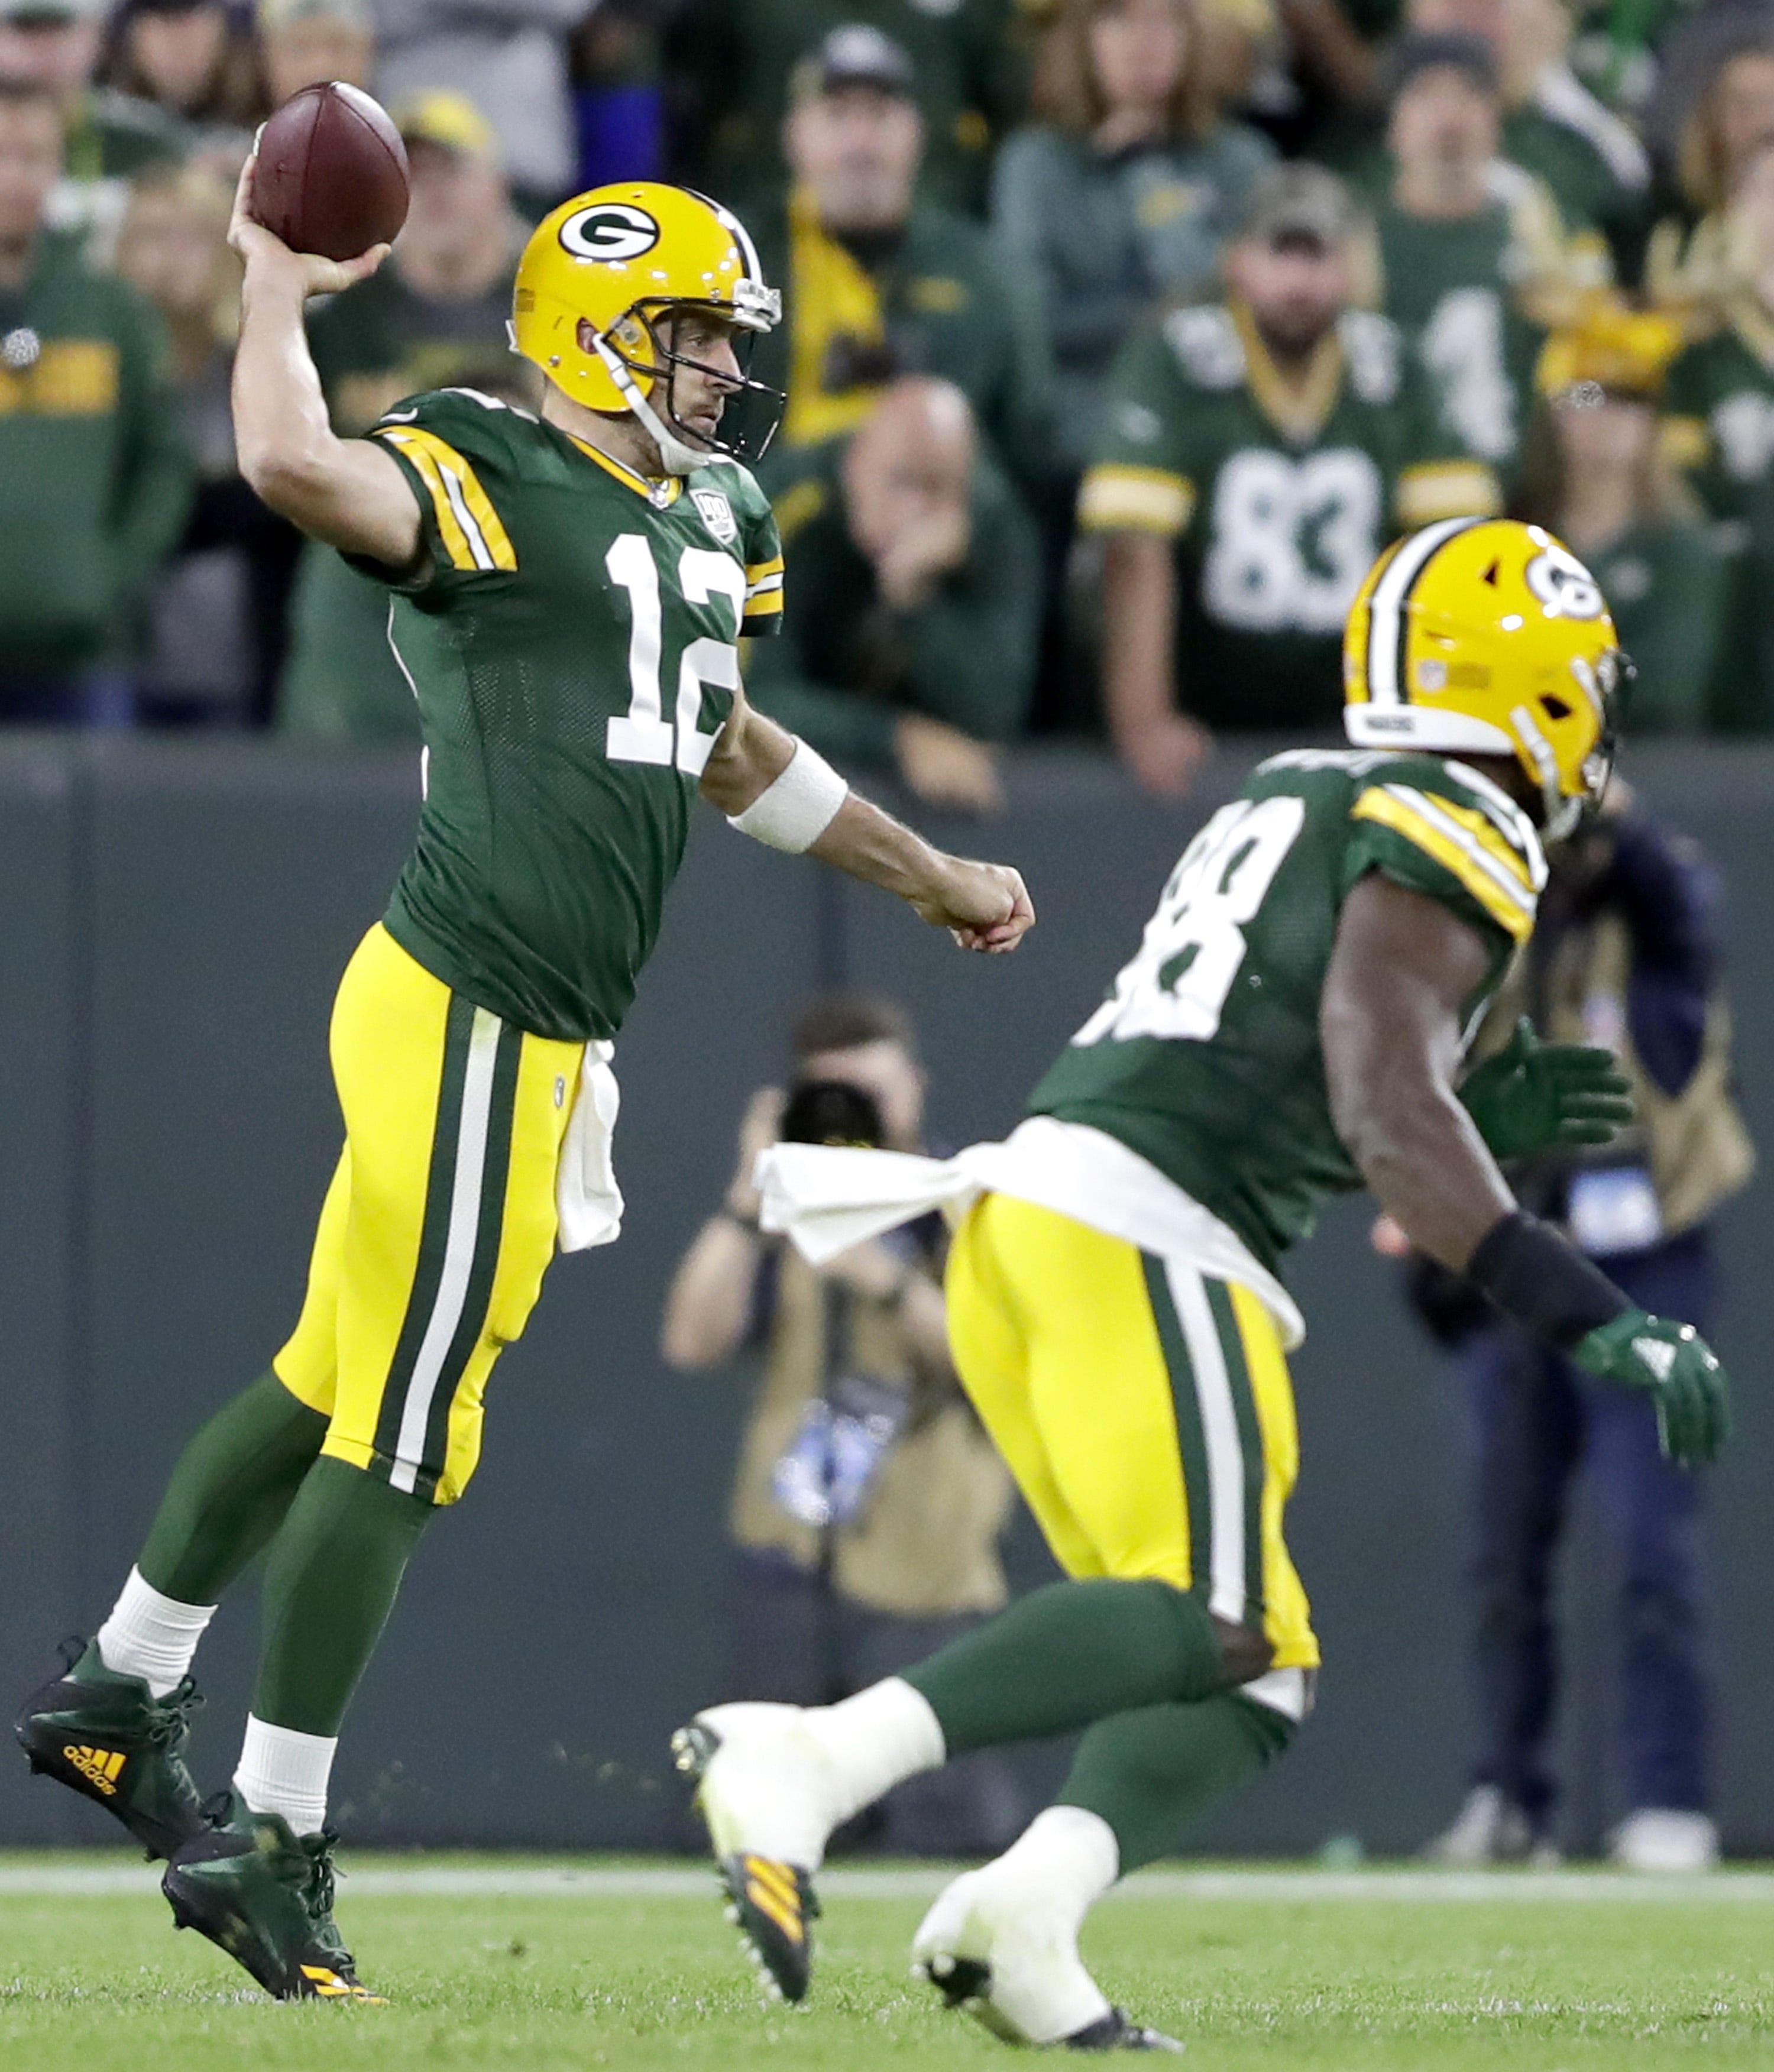 Apc Packers Vs Bears 2298 090918 Wag